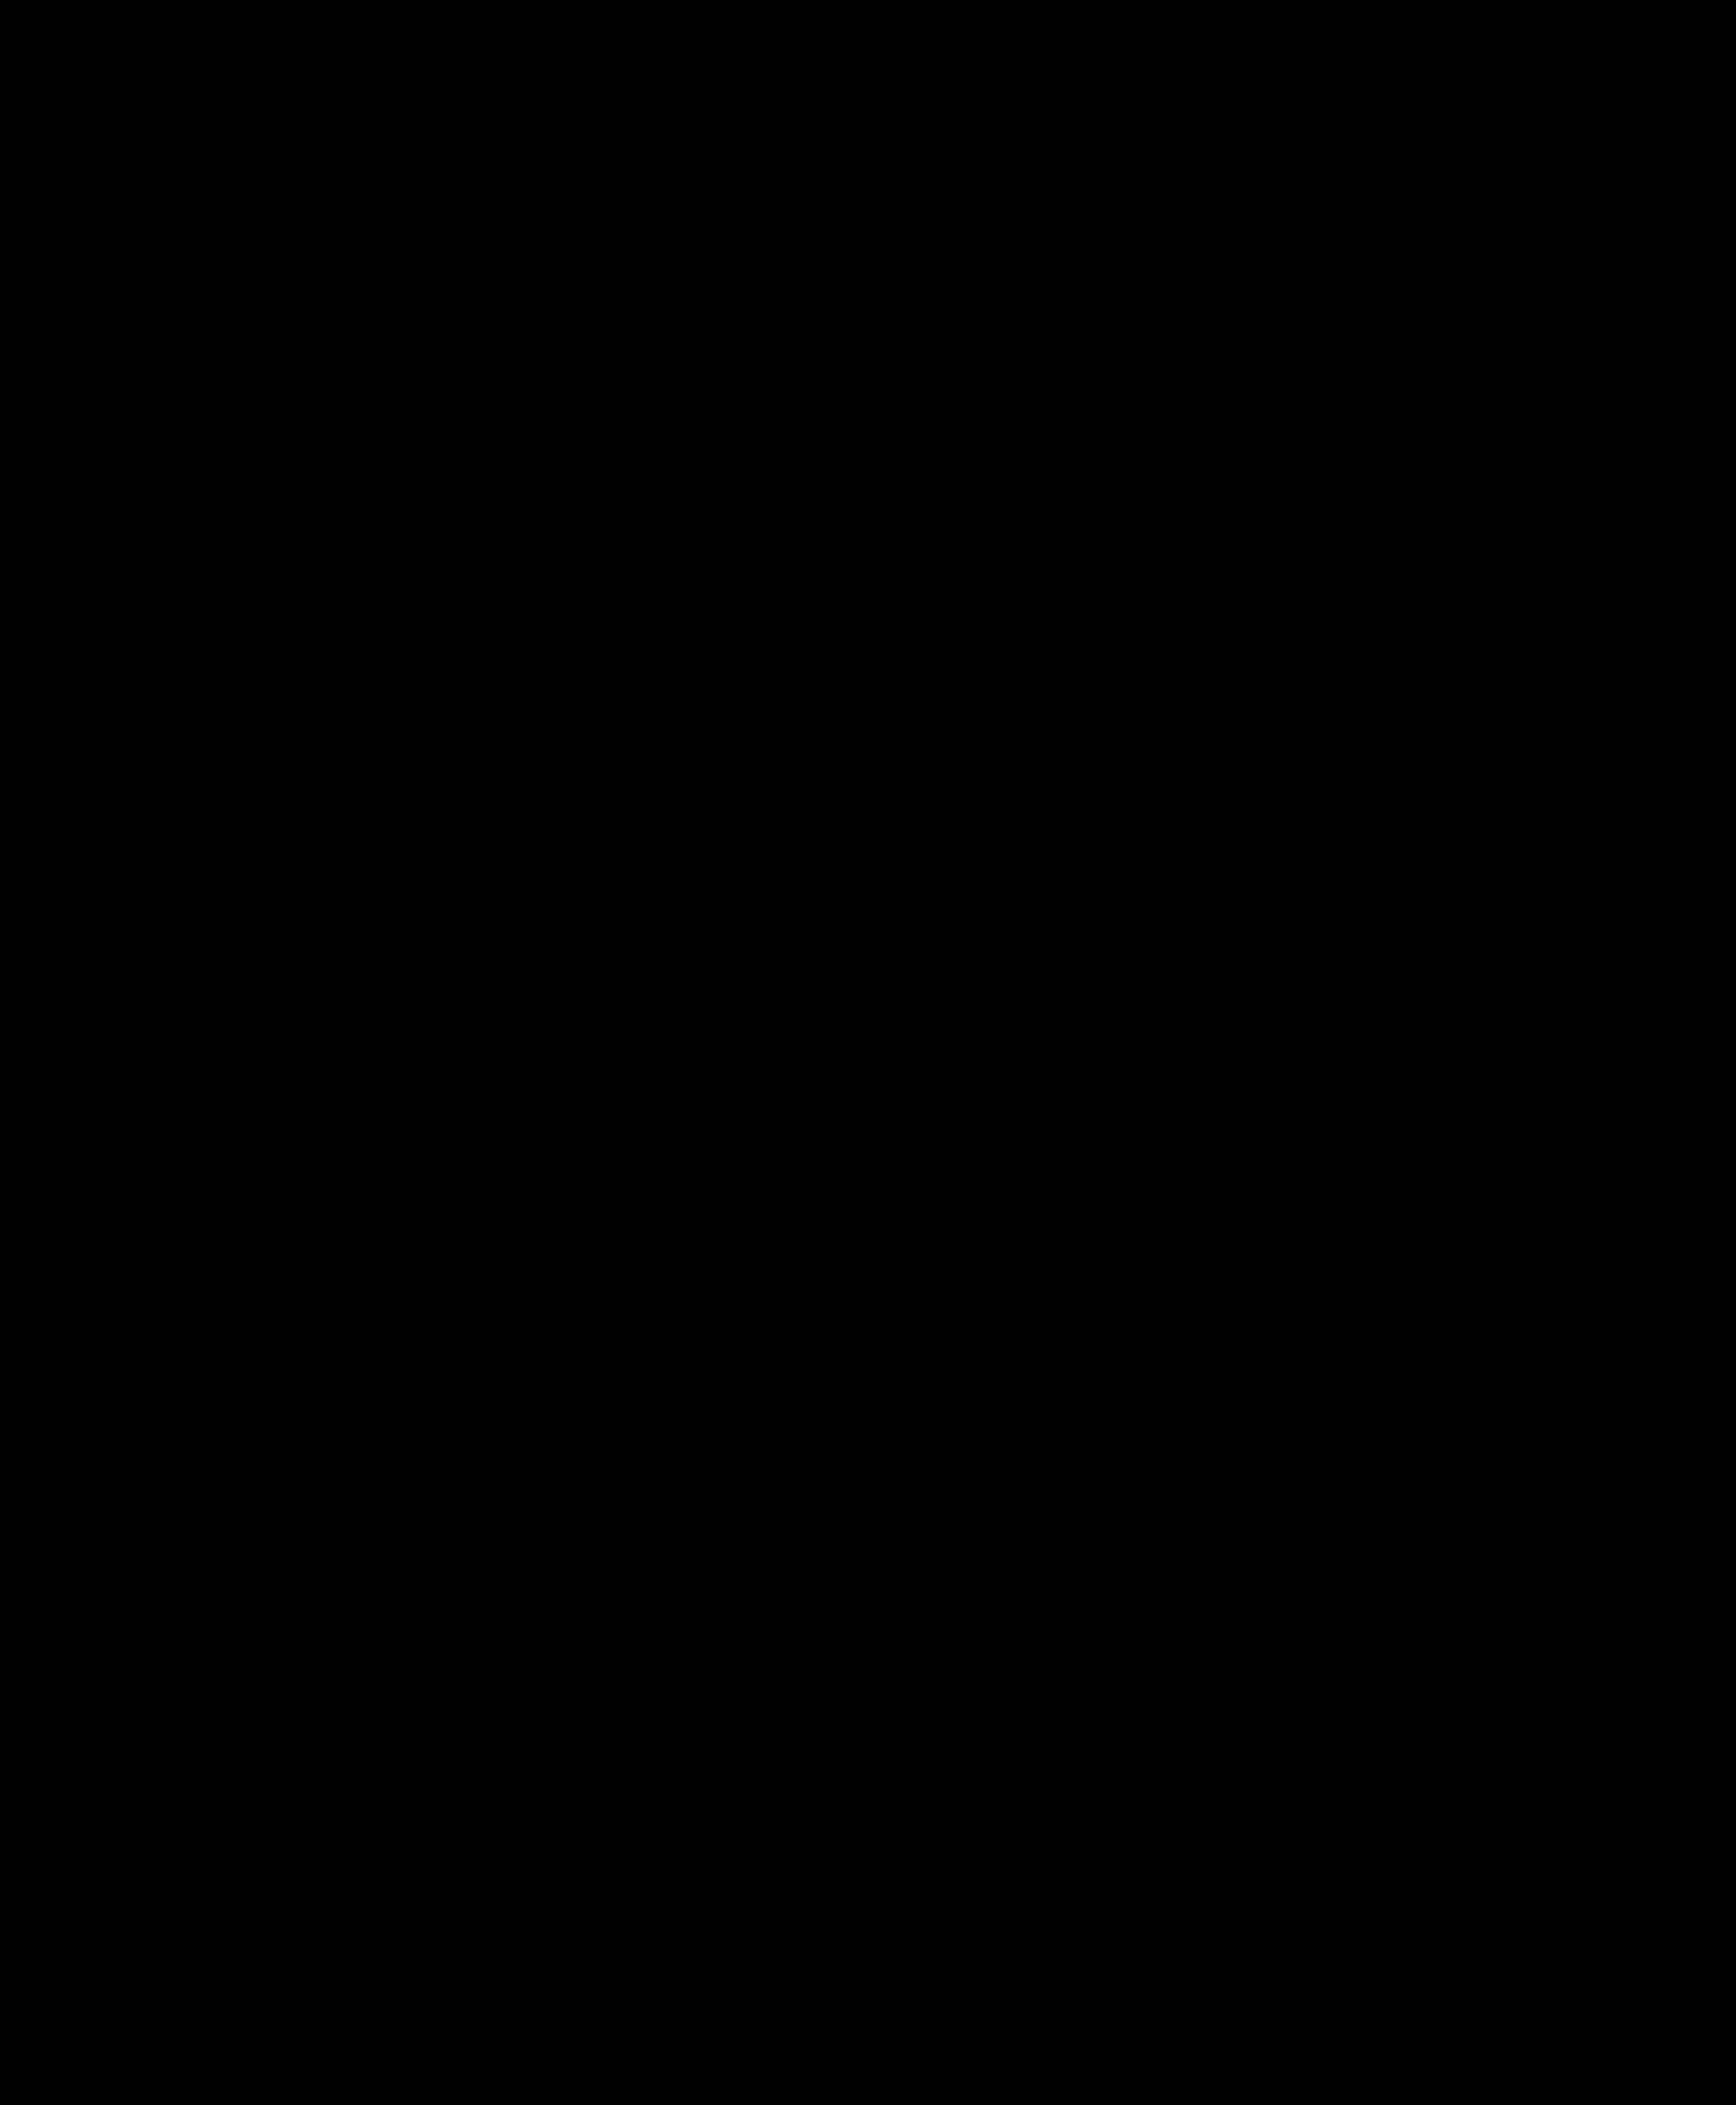 World war soldier silhouette. Soldiers clipart ww1